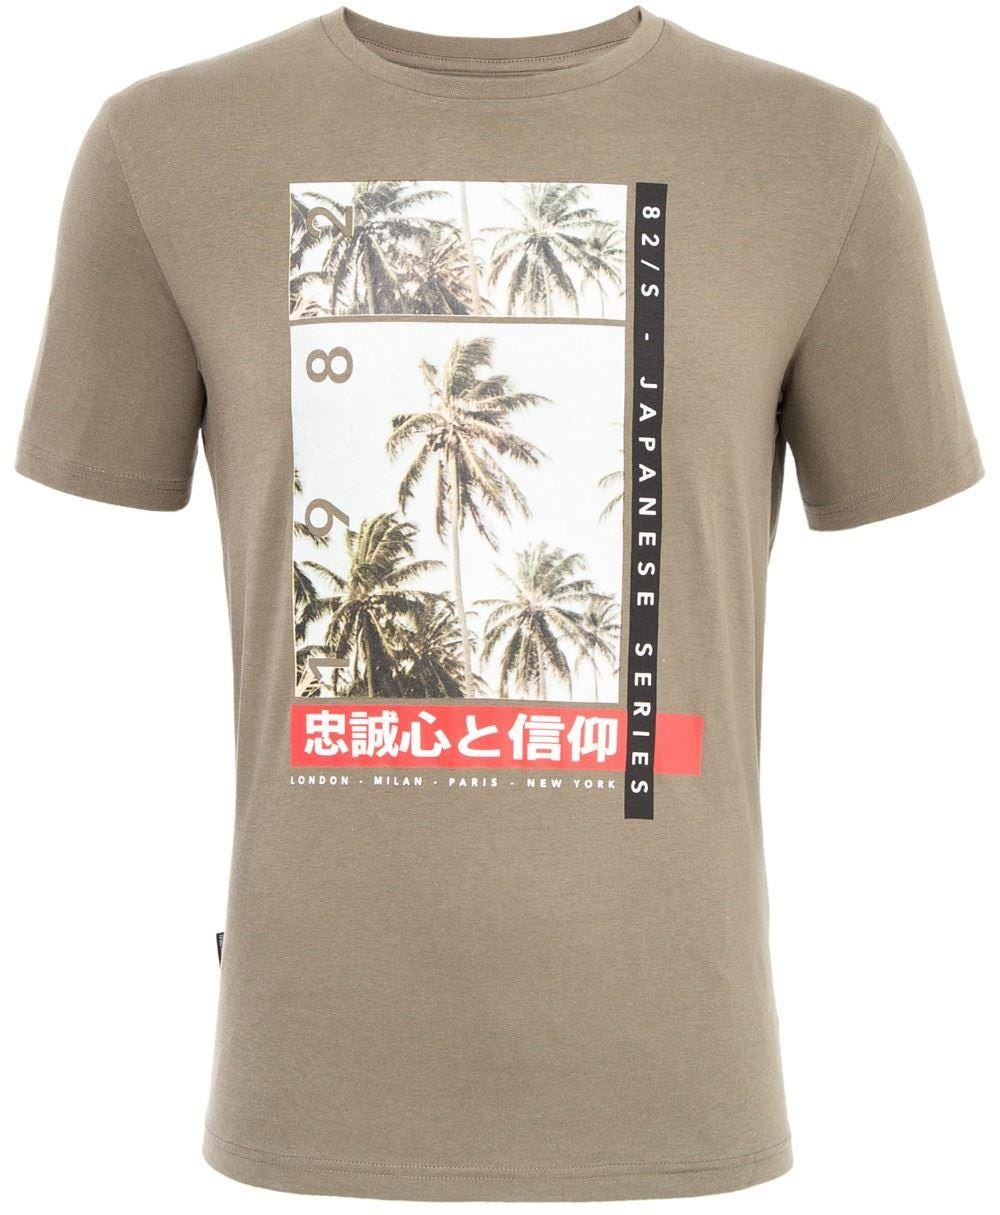 Loyalty & Faith Snap T-Shirt - Green|3XL